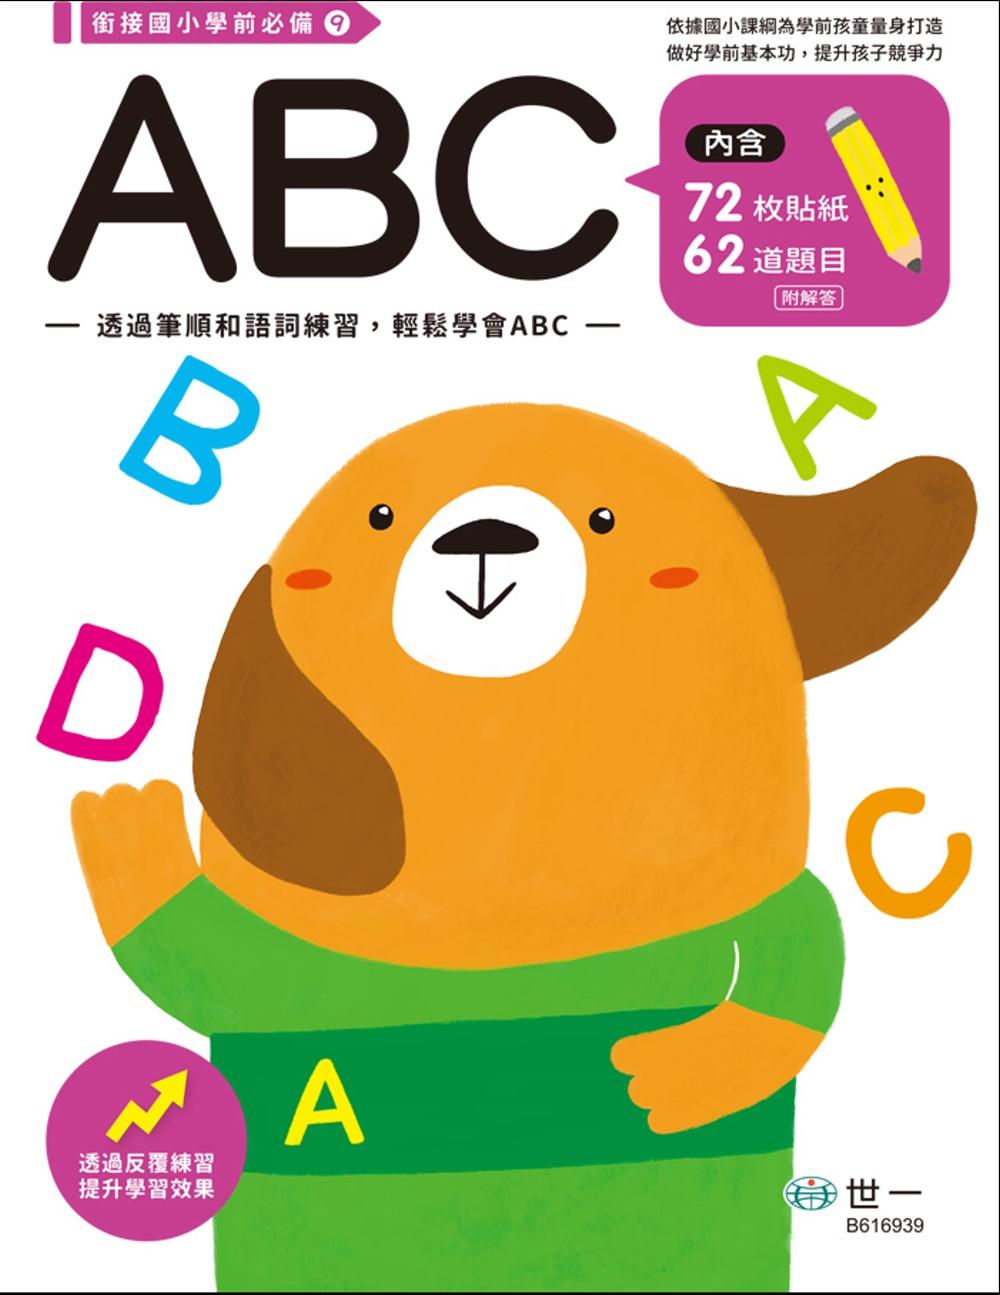 ABC練習本(獎勵貼紙1大張)